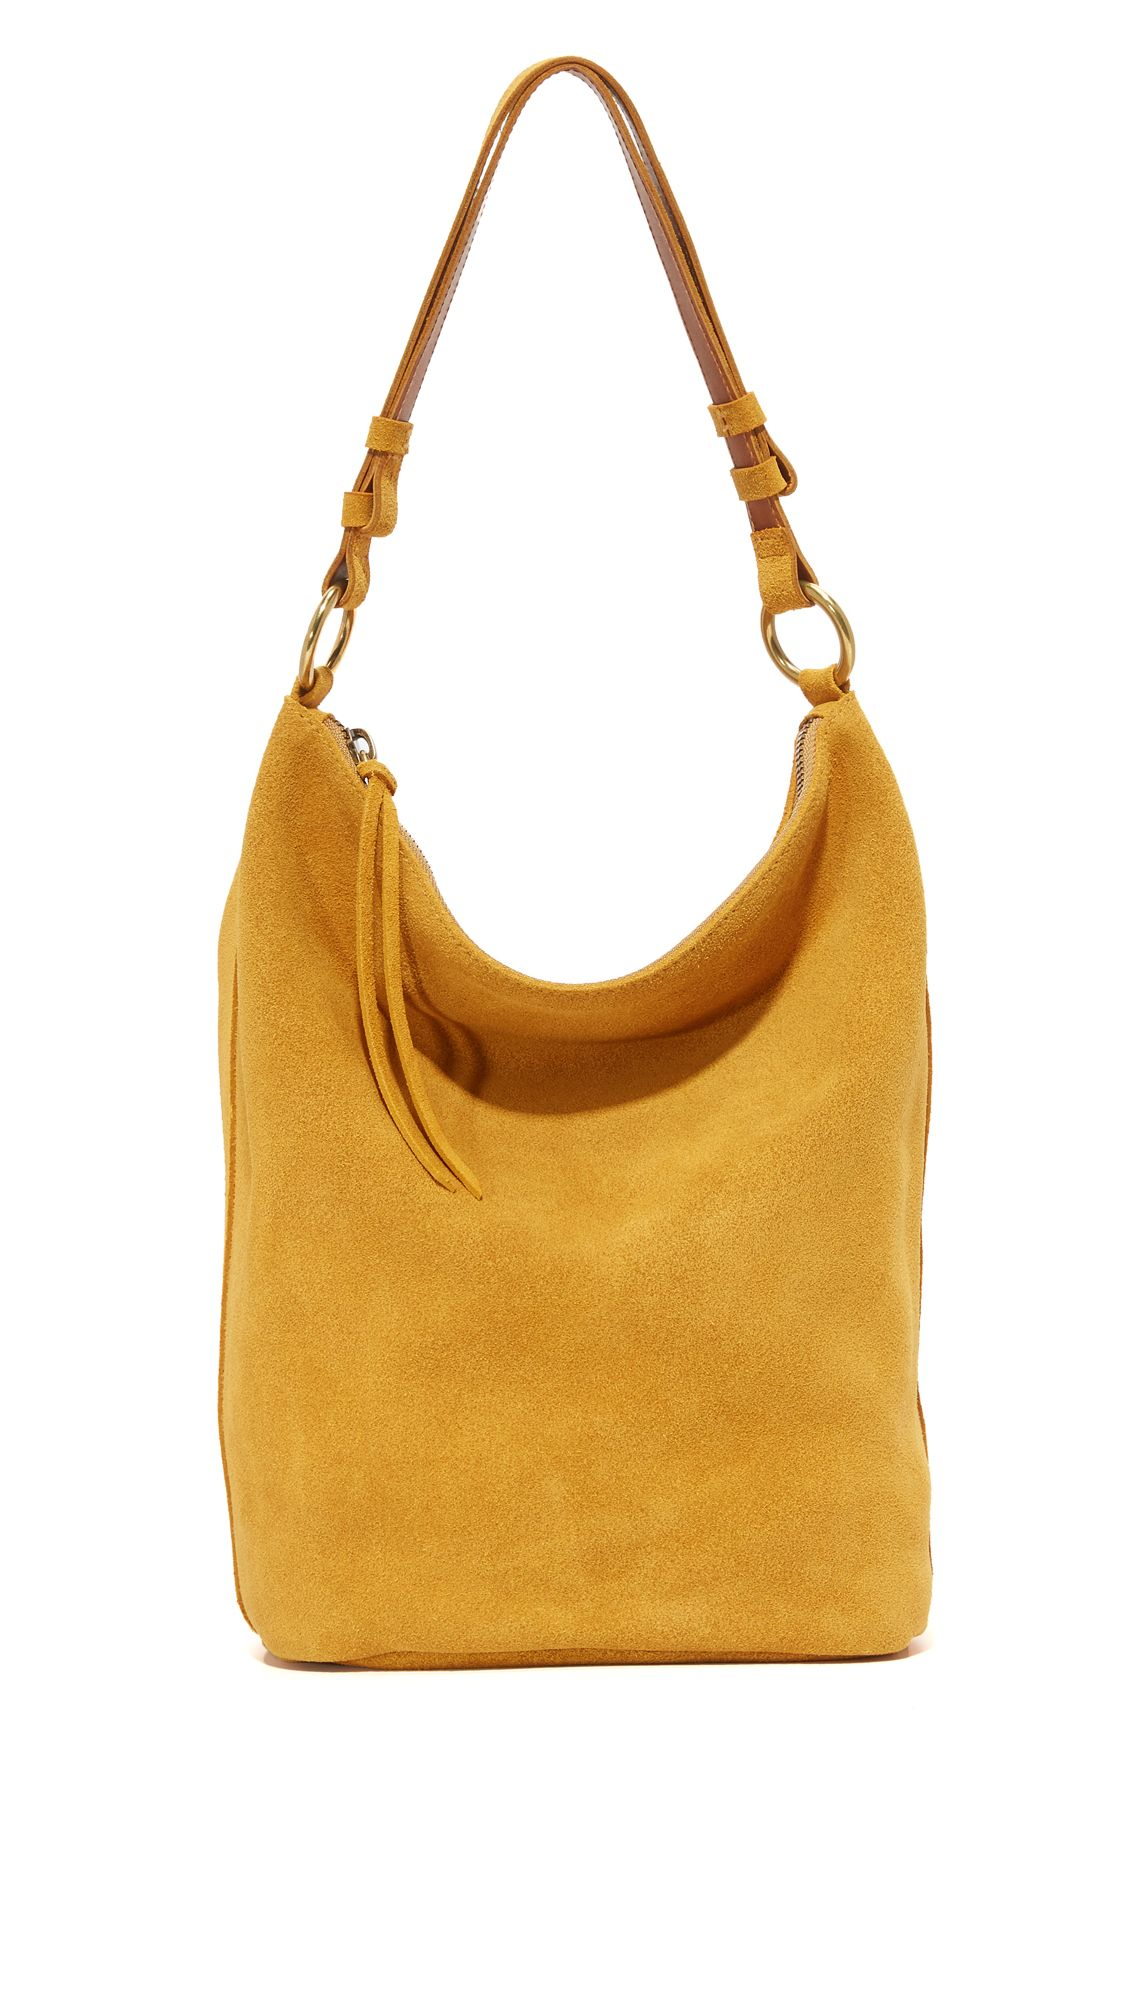 mustard yellow suede hobo bag  5cbb272ea1b63